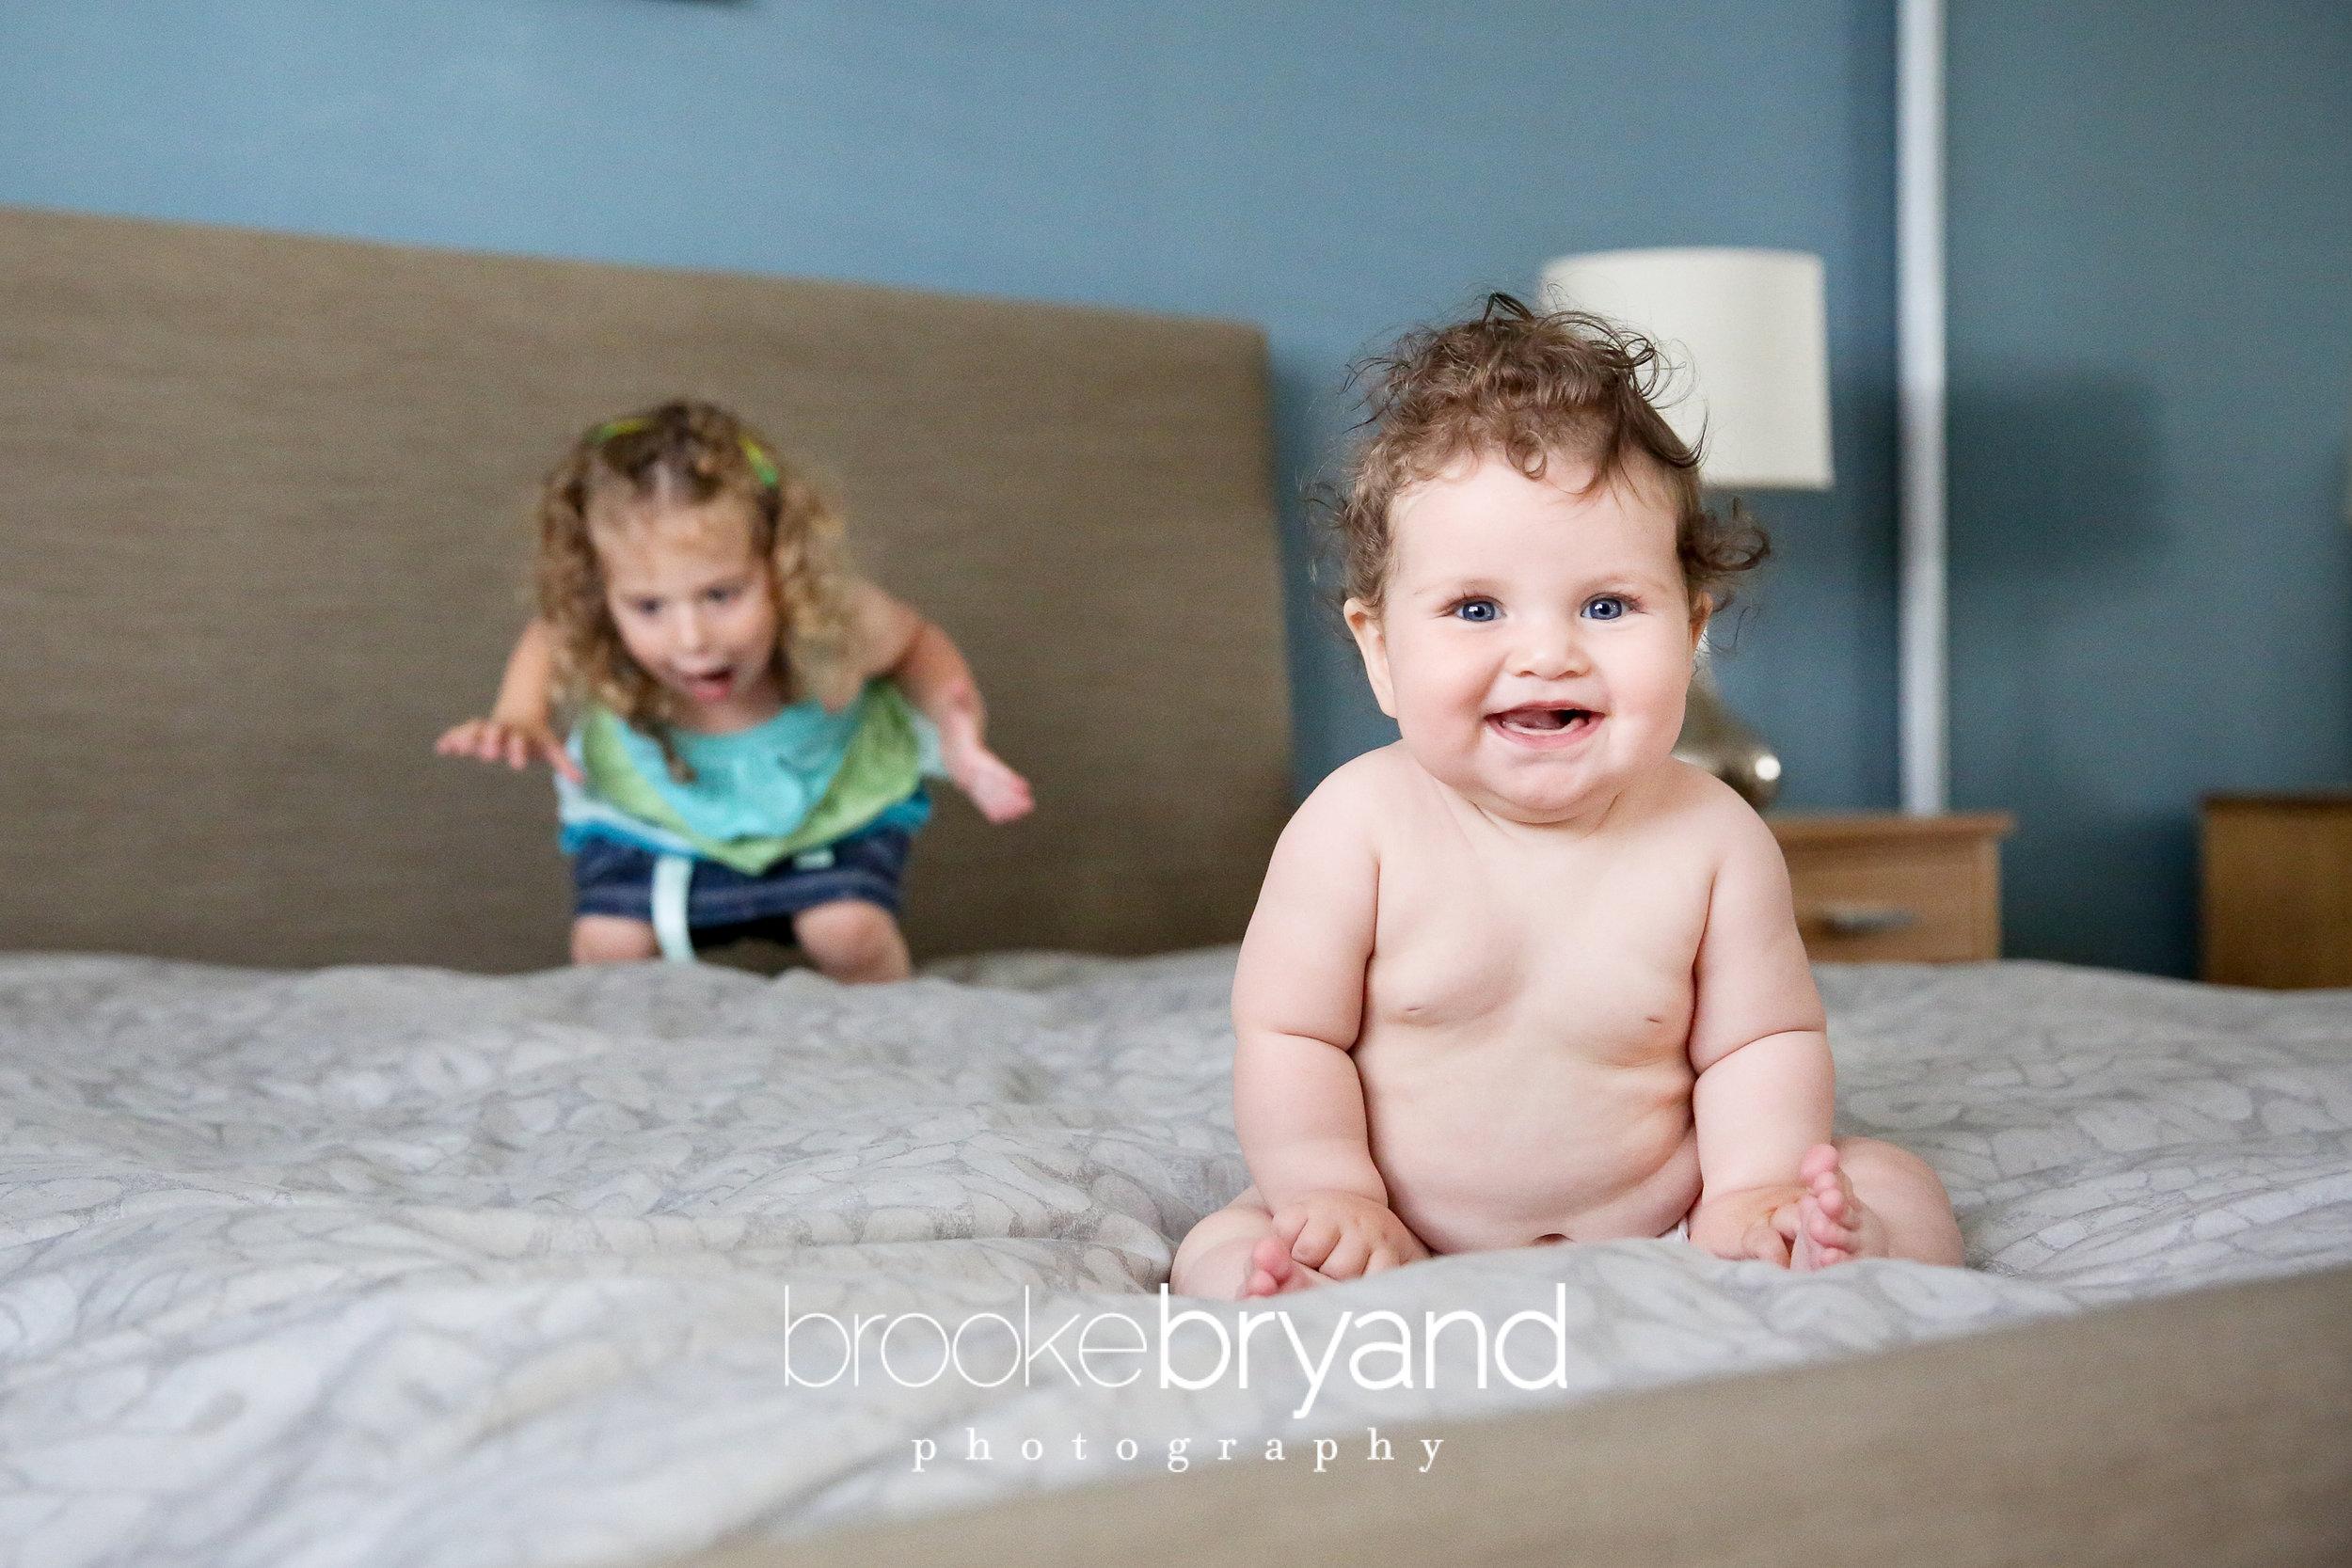 Brooke-Bryand-Photography-San-Francisco-Family-Photographer-IMG_3828.jpg